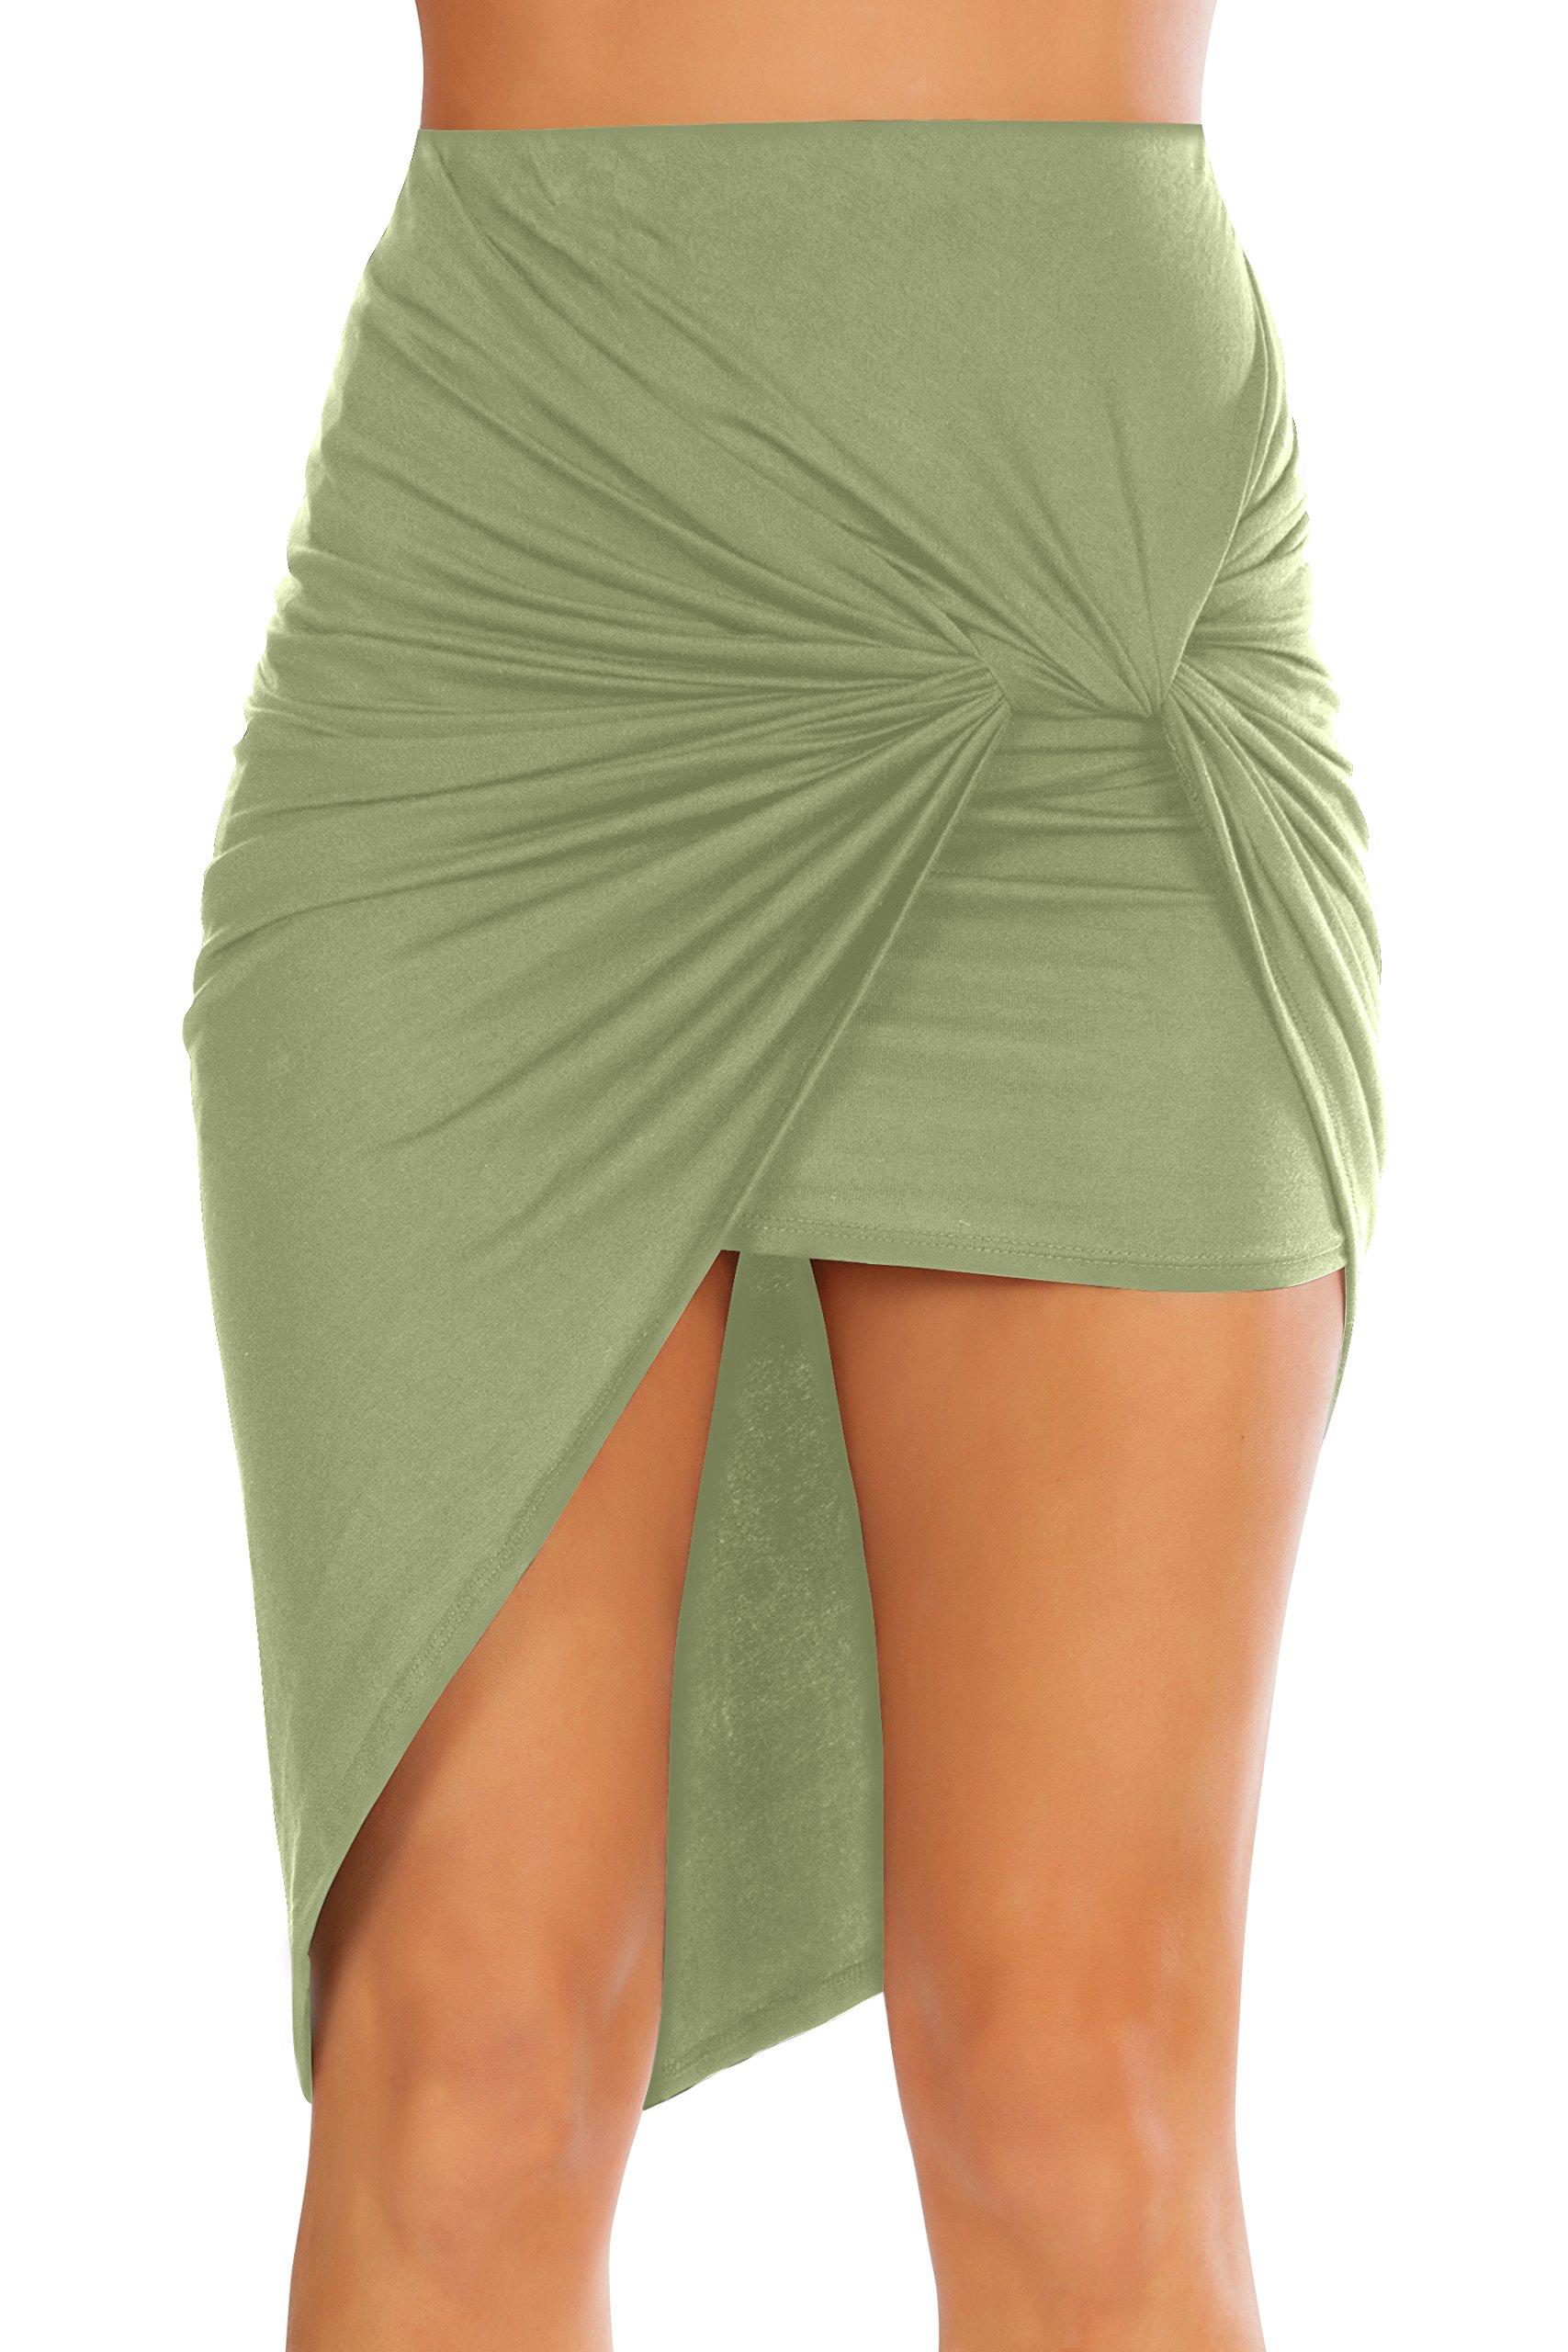 Womens Drape up Stretchy Asymmetrical High Low Short Mini Bodycon Pencil Skirt Sage Medium